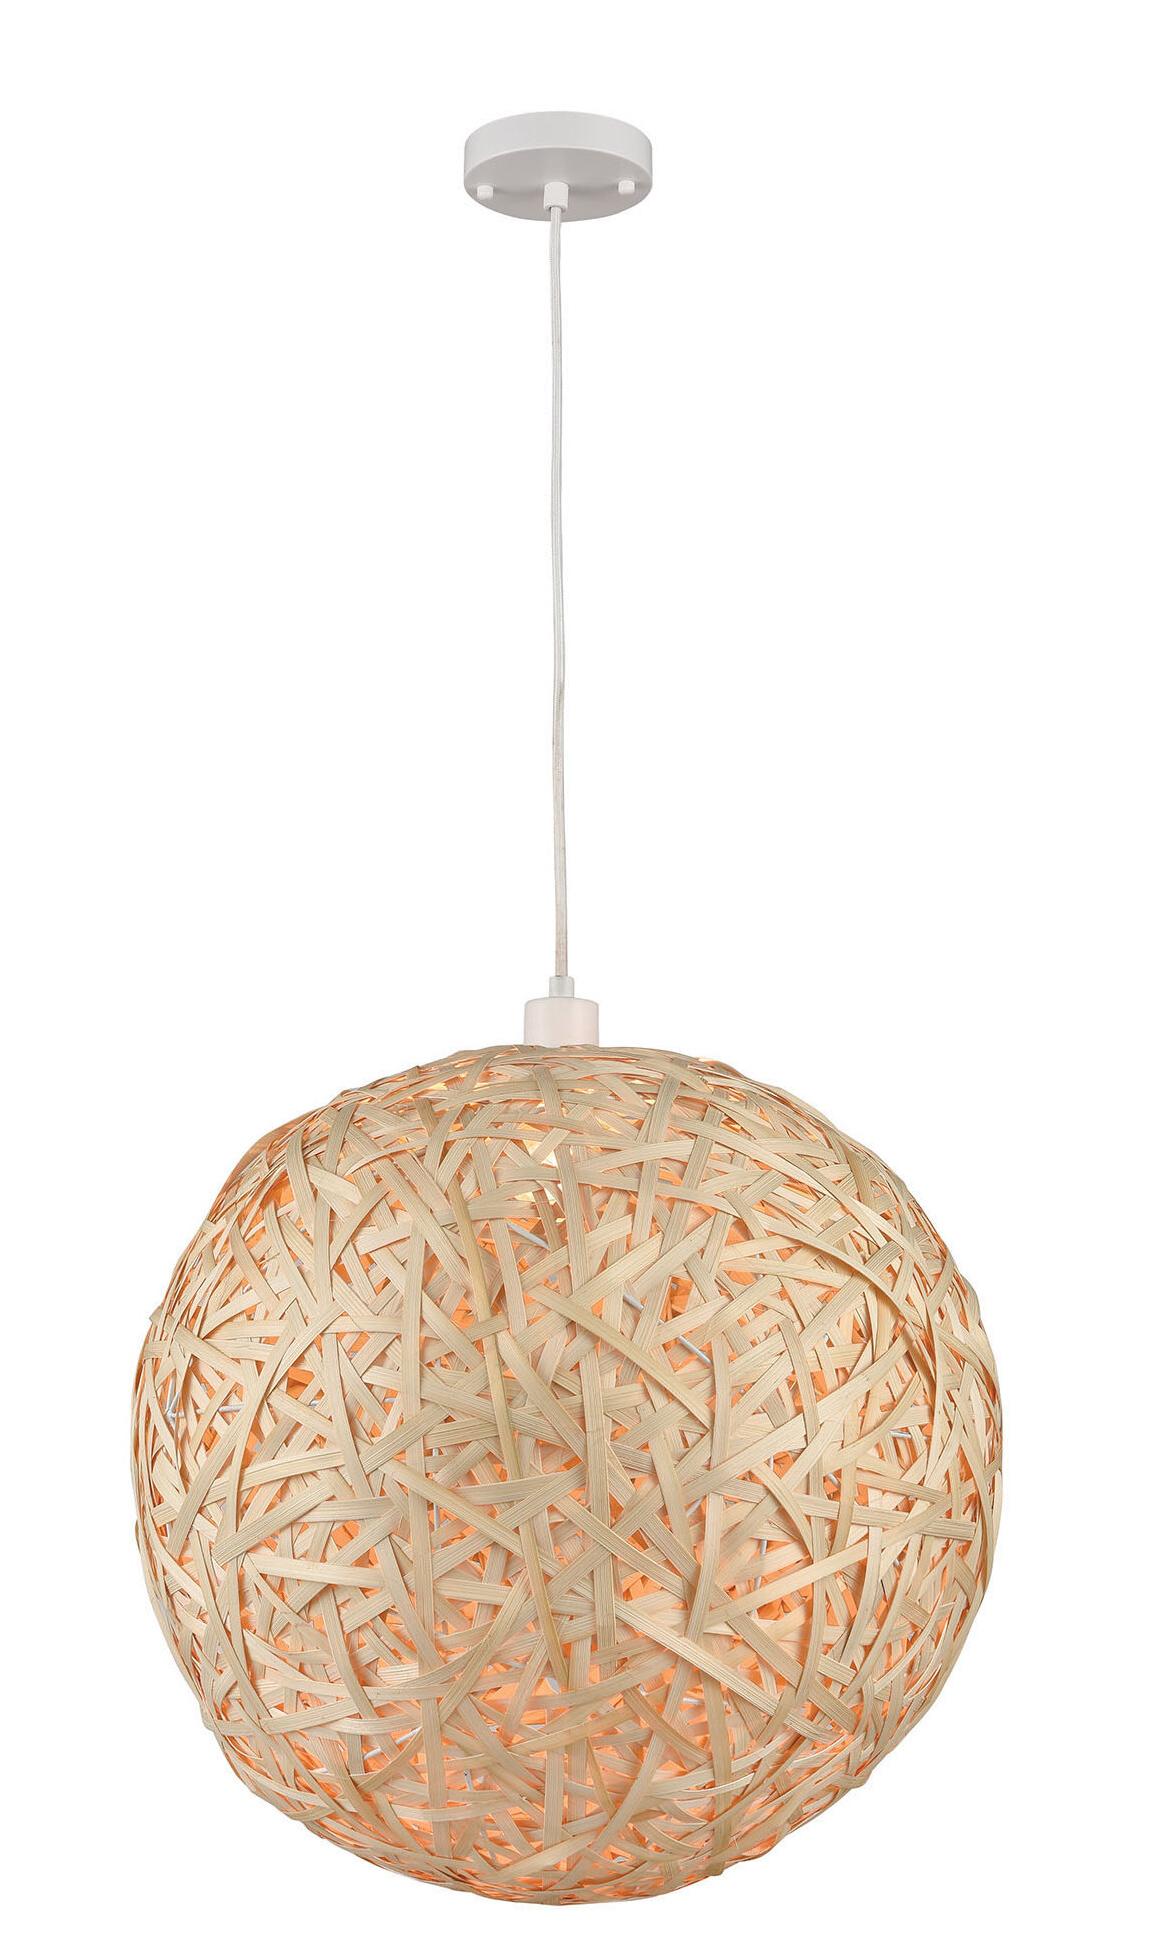 Jodi 1 Light Globe Pendant Pertaining To Newest Devereaux 1 Light Single Globe Pendants (Gallery 6 of 20)